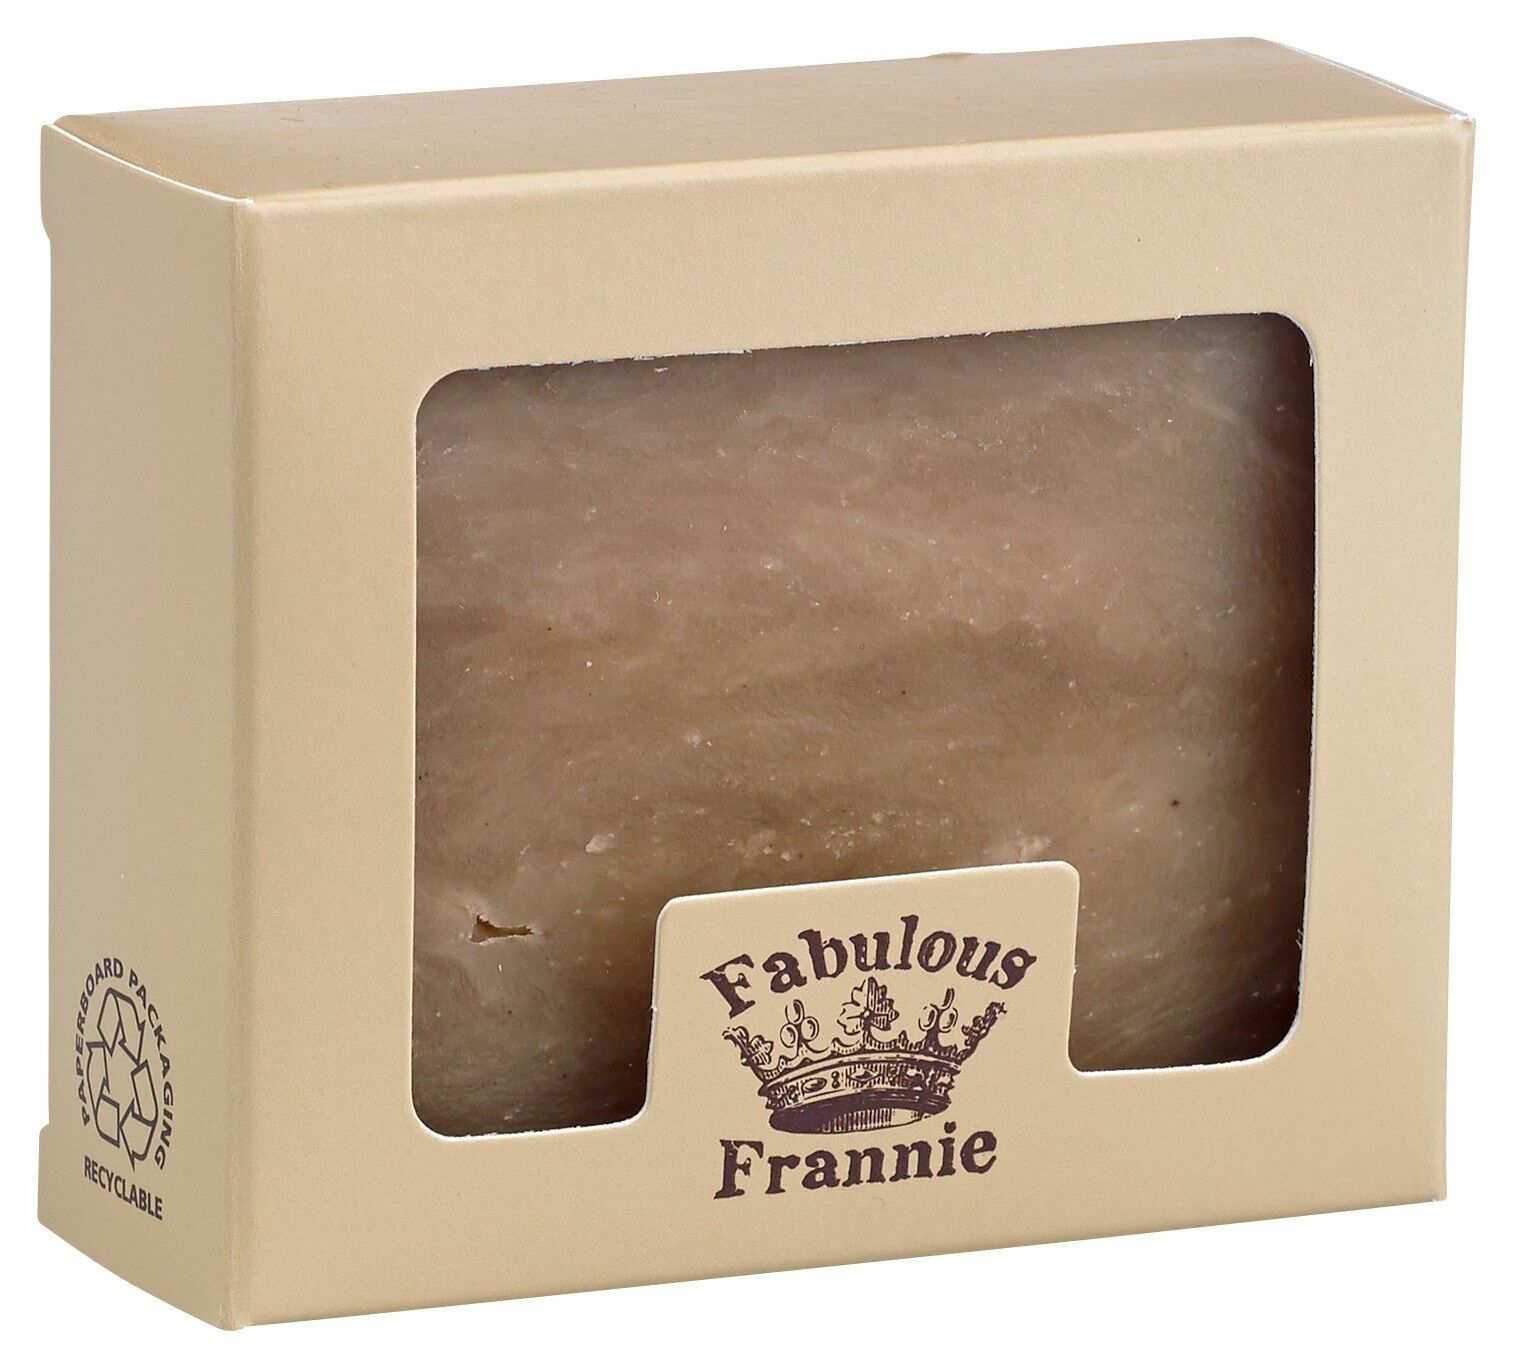 FRANKINCENSE & MYRRH Herbal Soap Bar Pure Essential Oils by